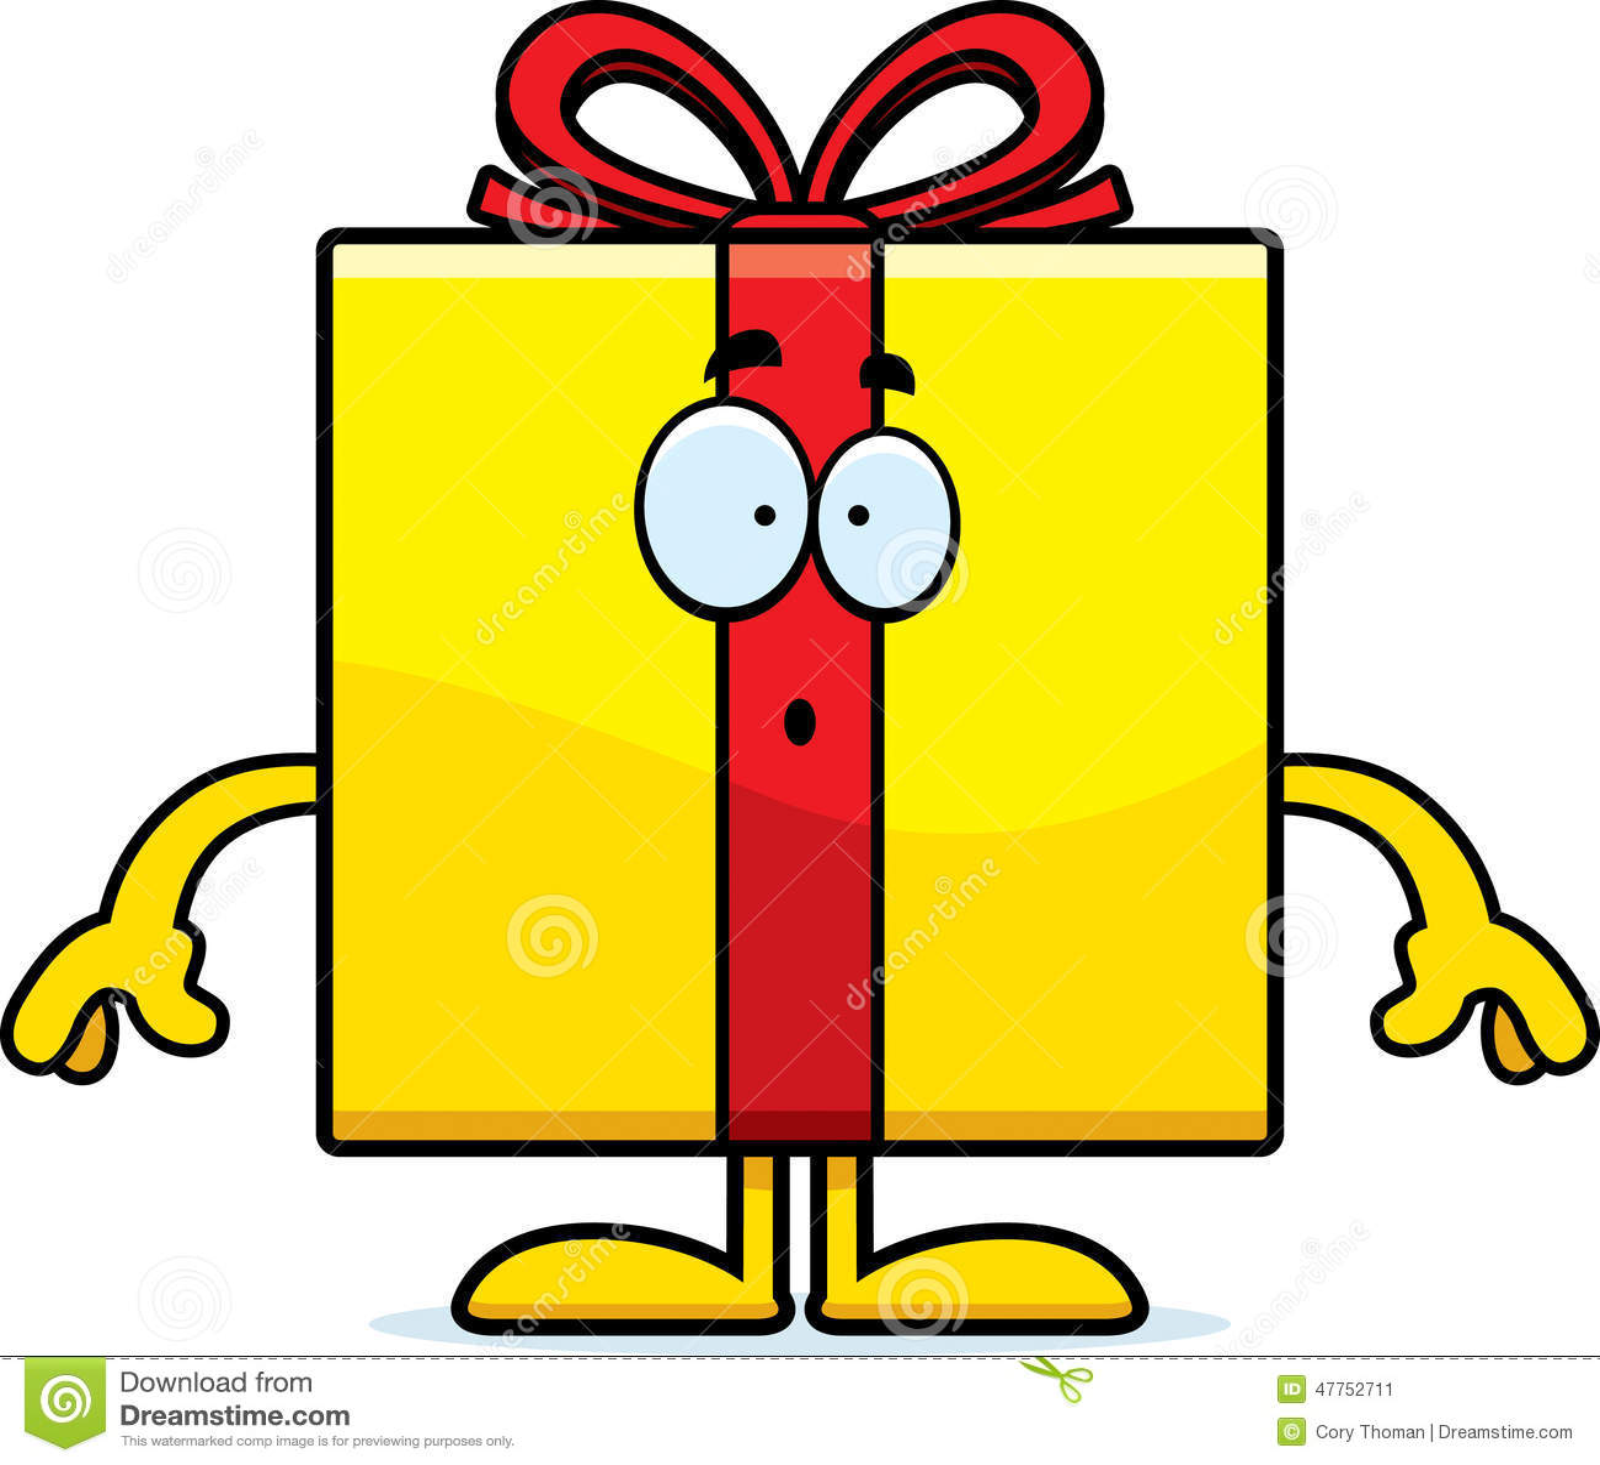 Surprised Cartoon Birthday Gift Stock Vector Illustration Of Gift